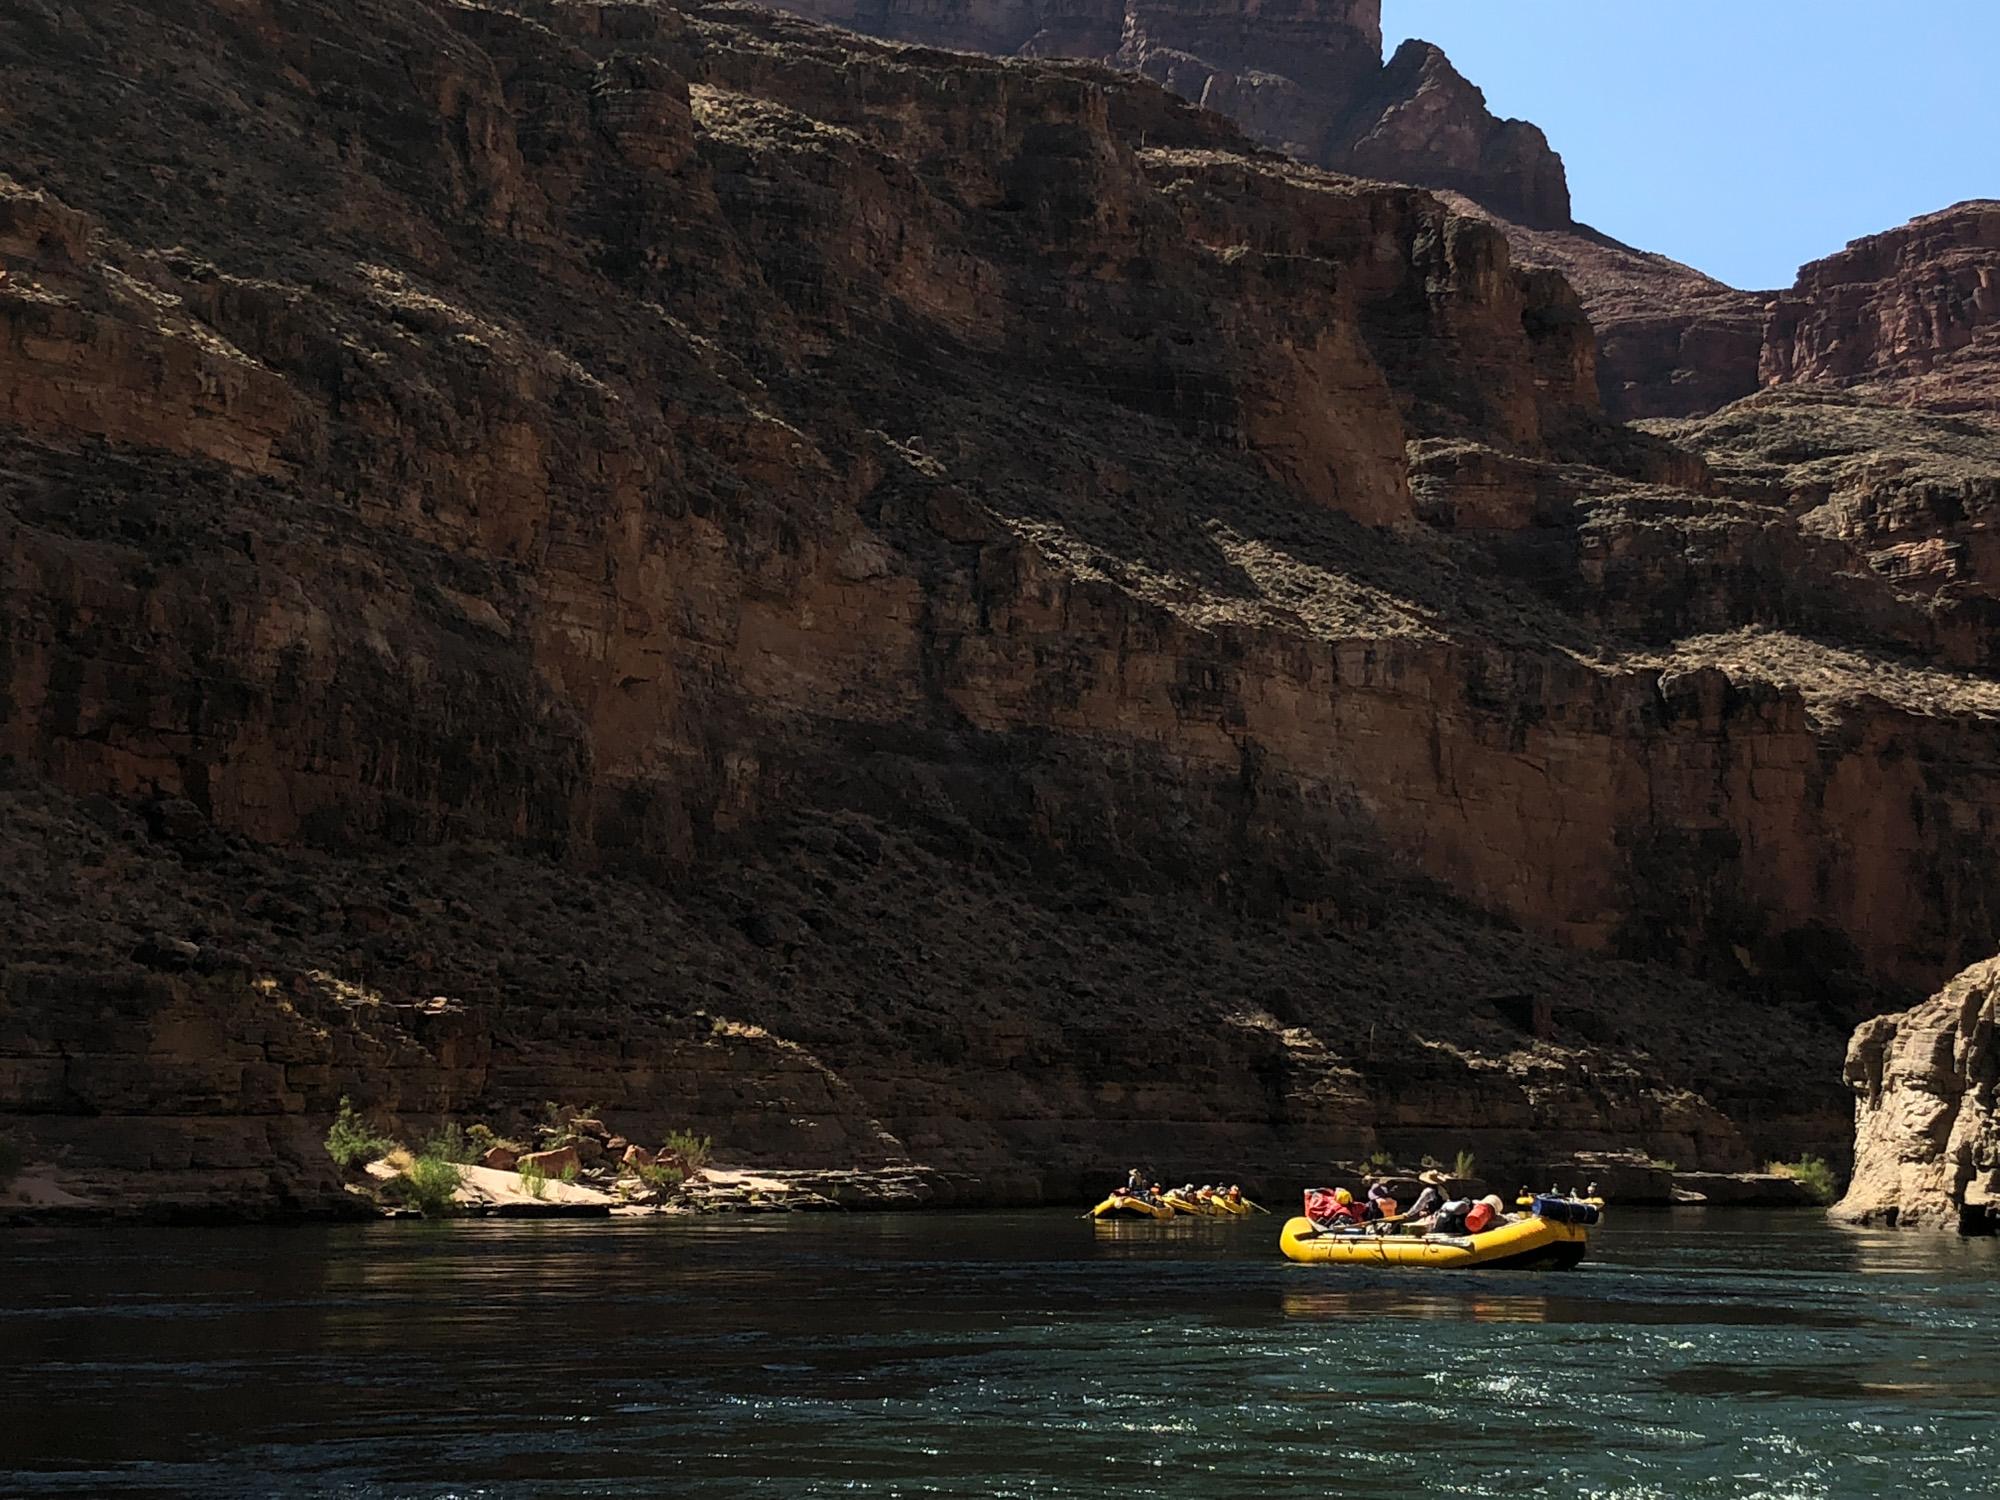 Raft flotilla on the Colorado River